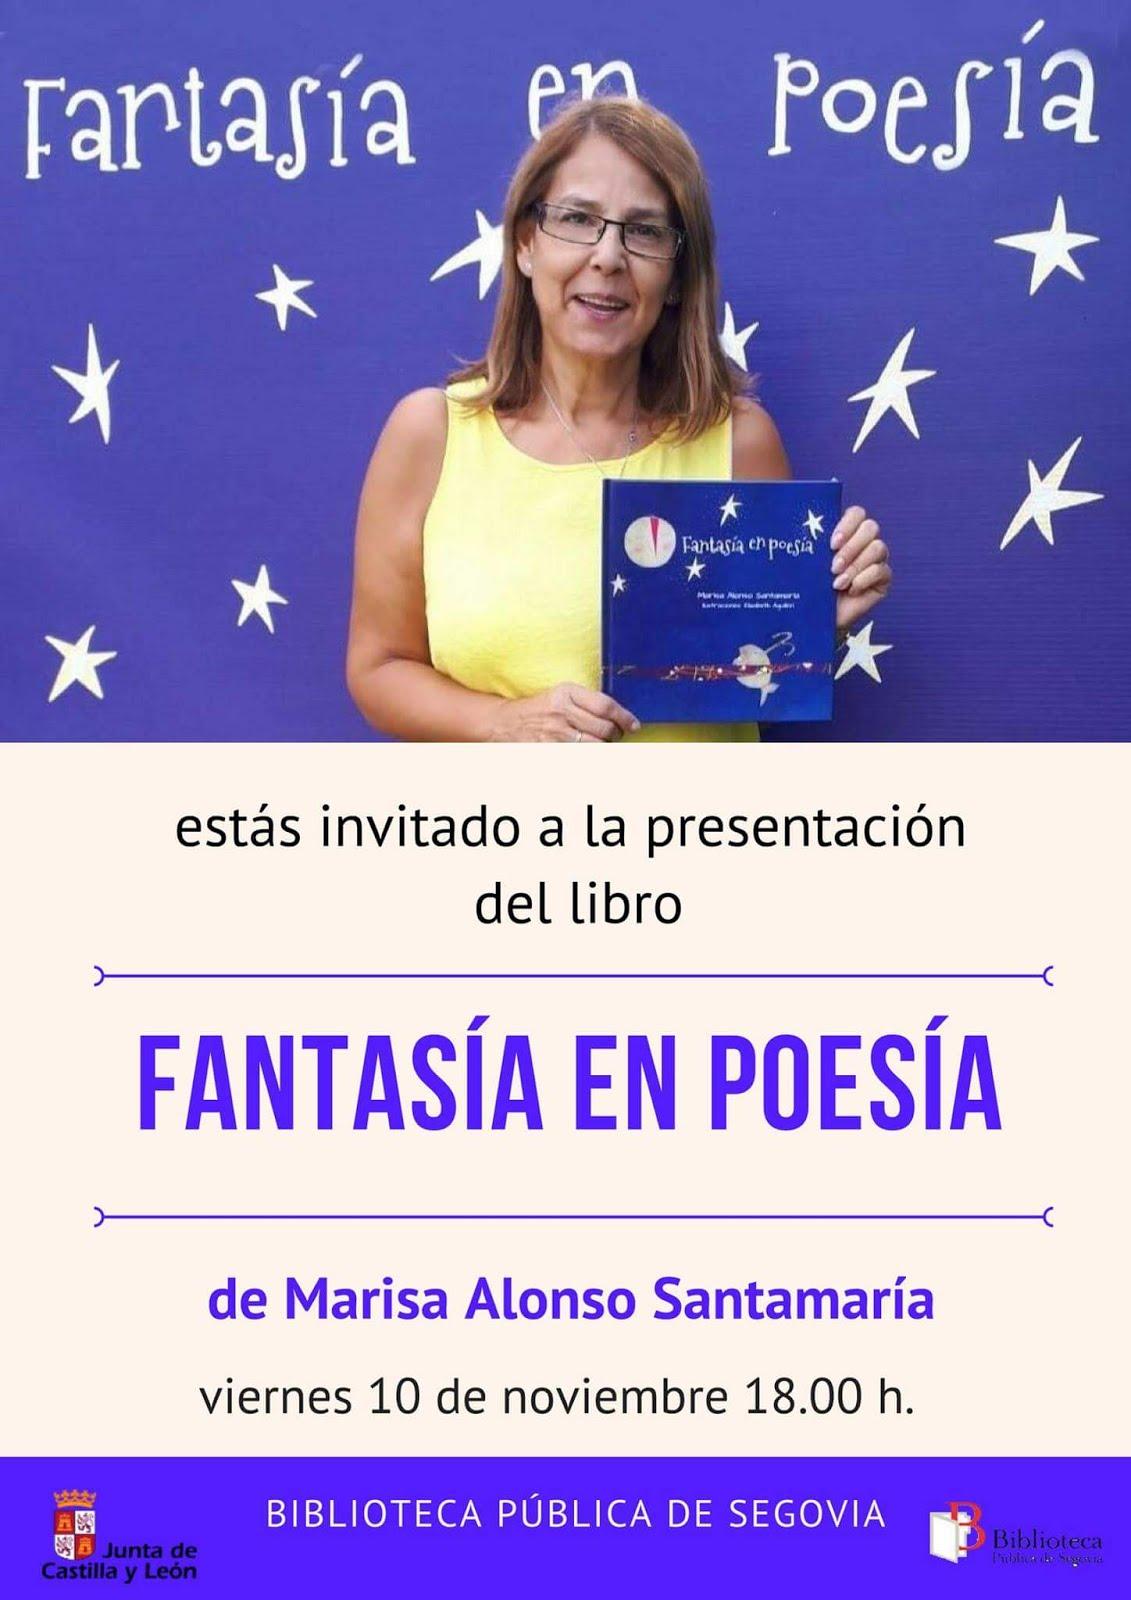 En la Biblioteca Pública de Segovia